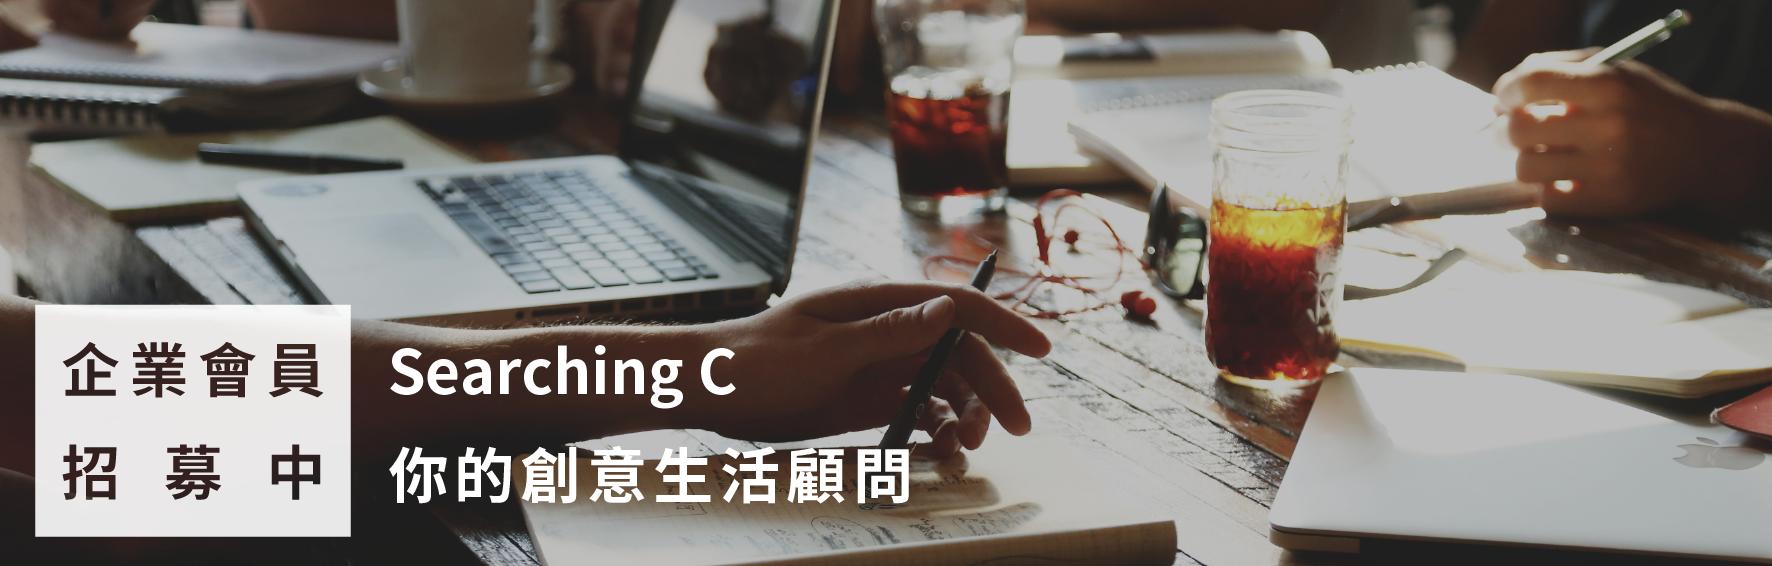 SearchingC 企業會員